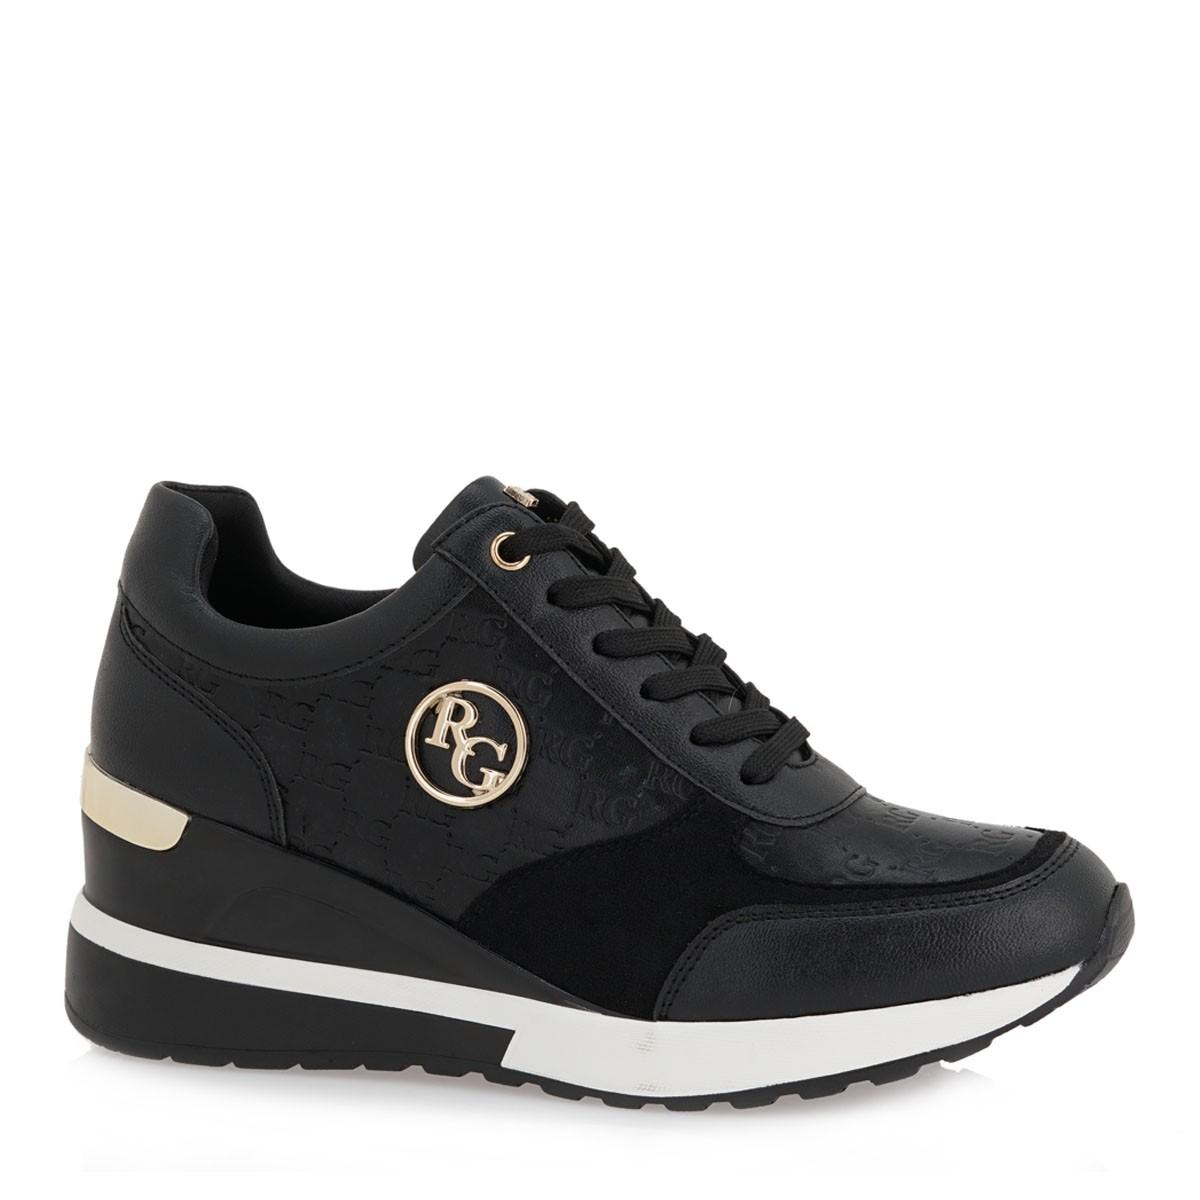 Renato Garini Γυναικεία Παπούτσια Sneakers 929-EX9929 Μαύρο Στάμπα L119R9293S41